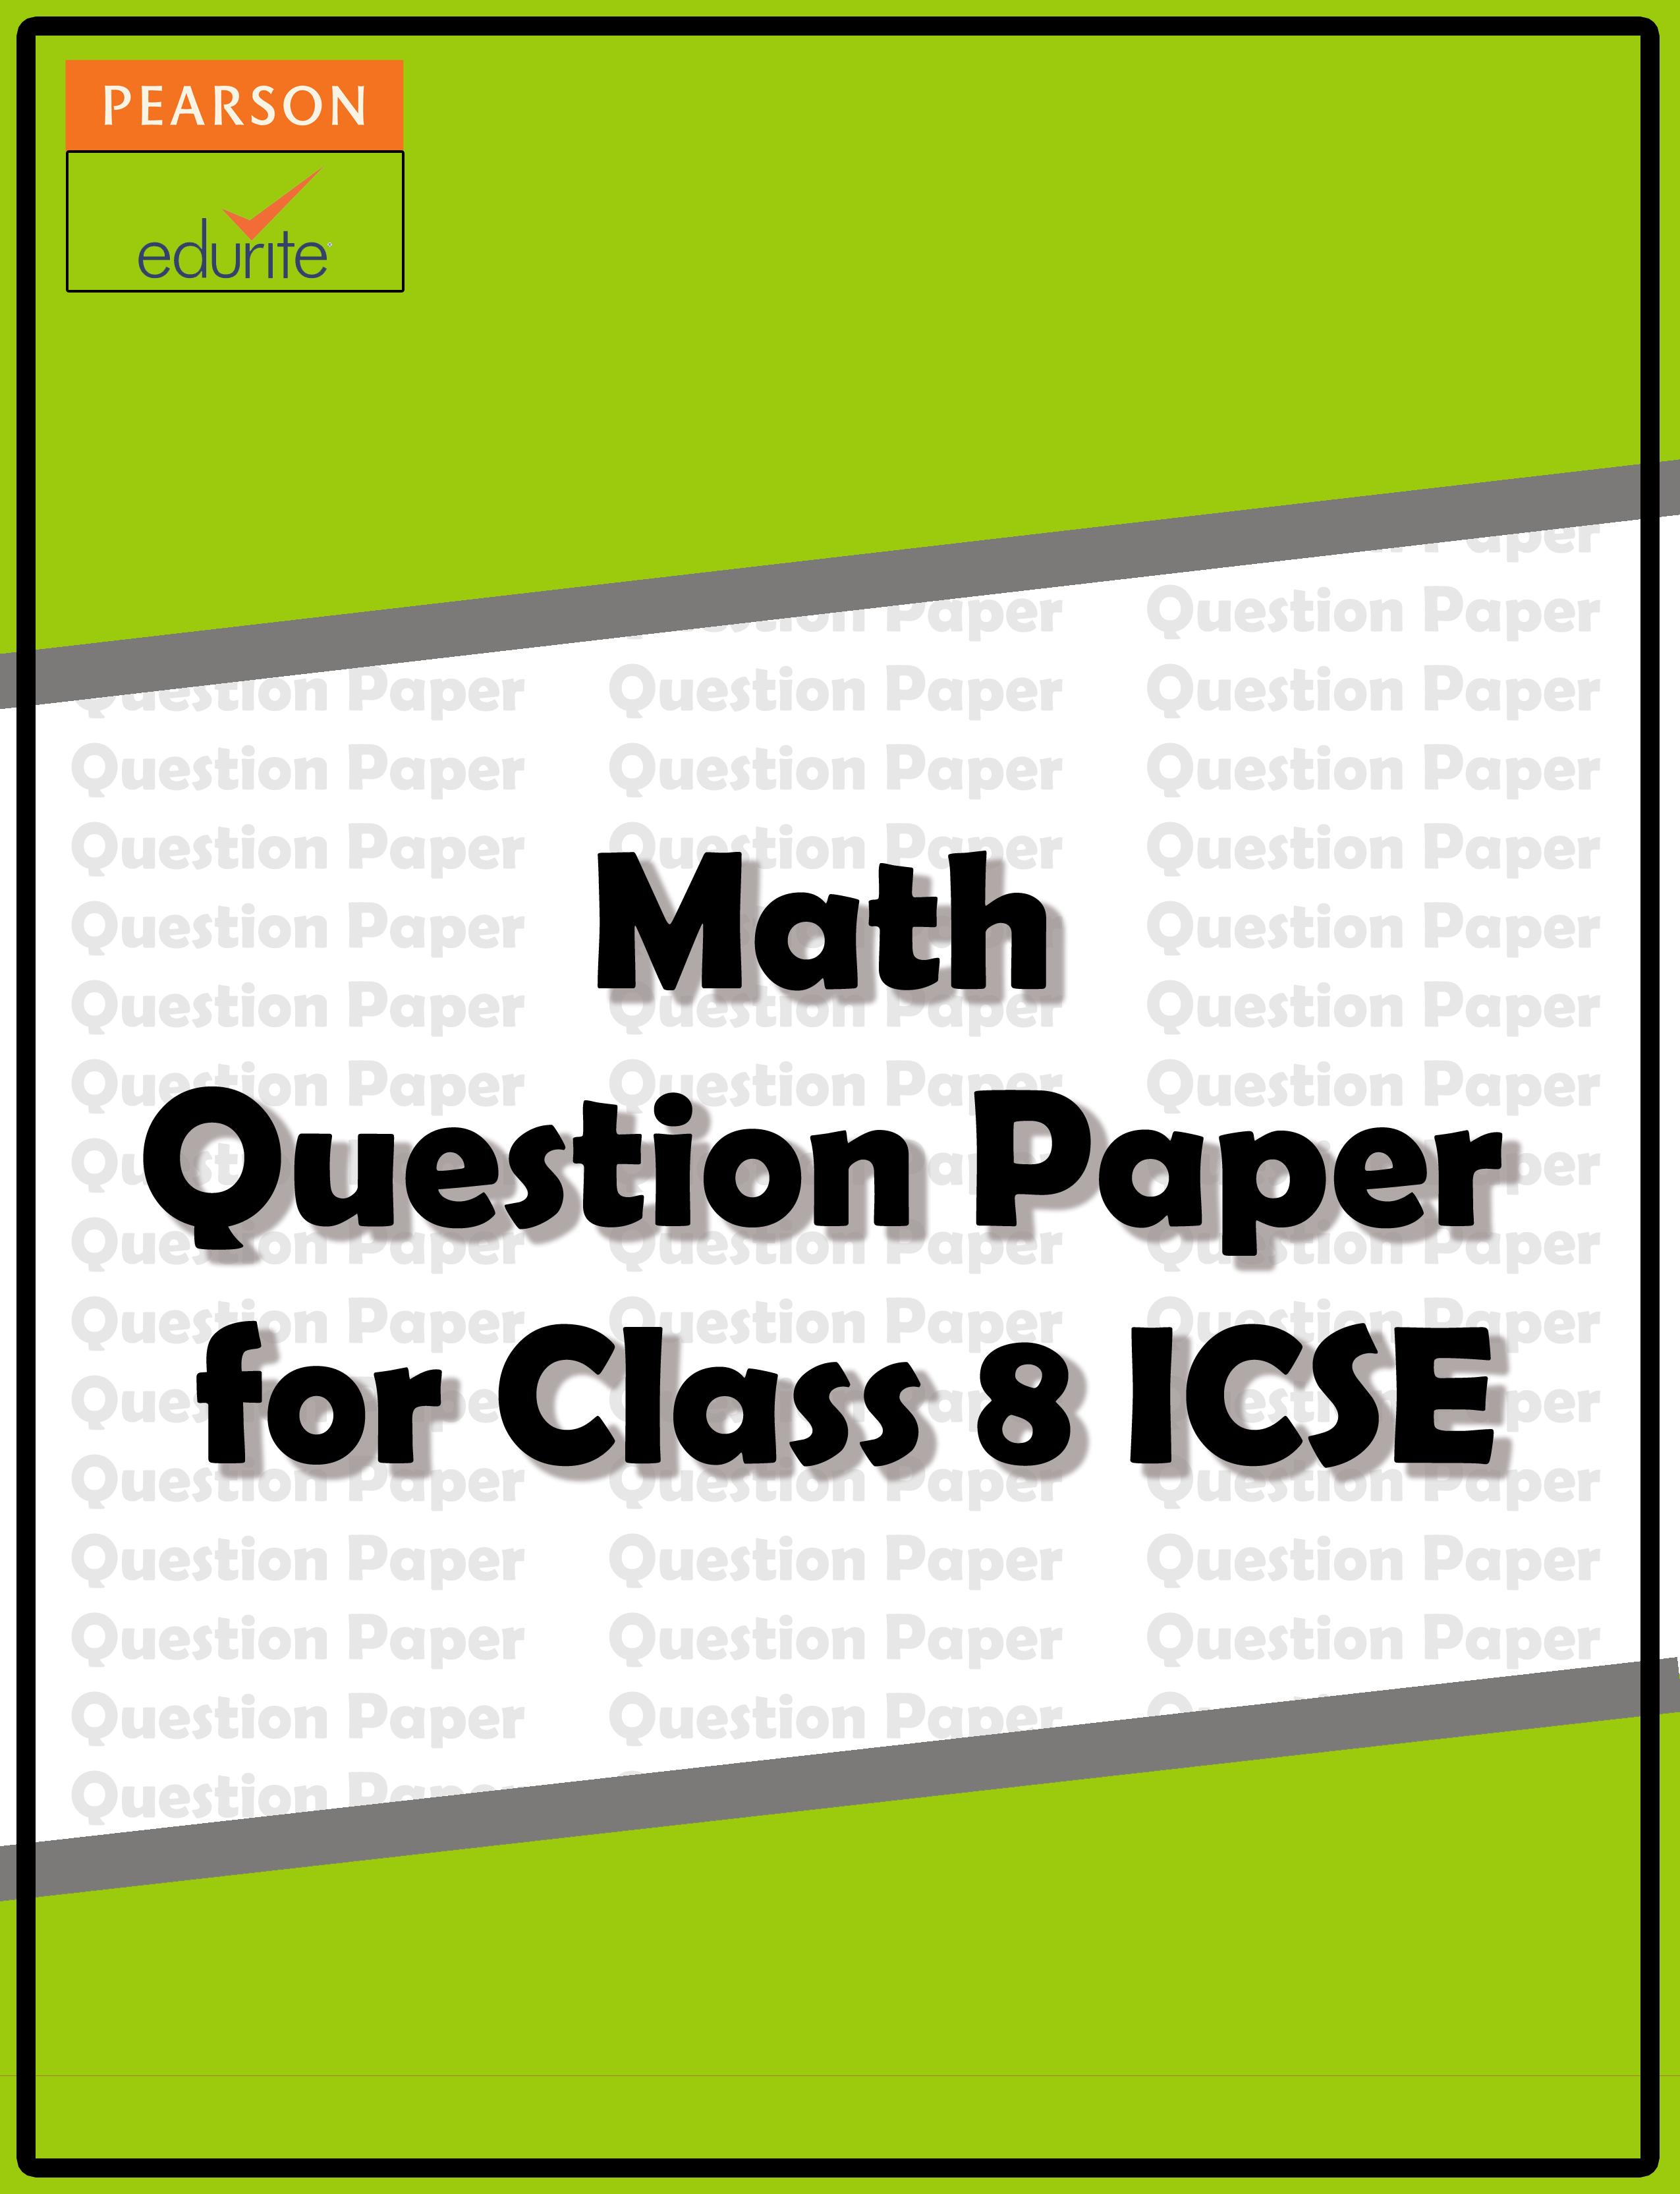 worksheet Maths Worksheets For Class 8 Icse maths question paper for class 8 icse httpicse edurite comicse edurite